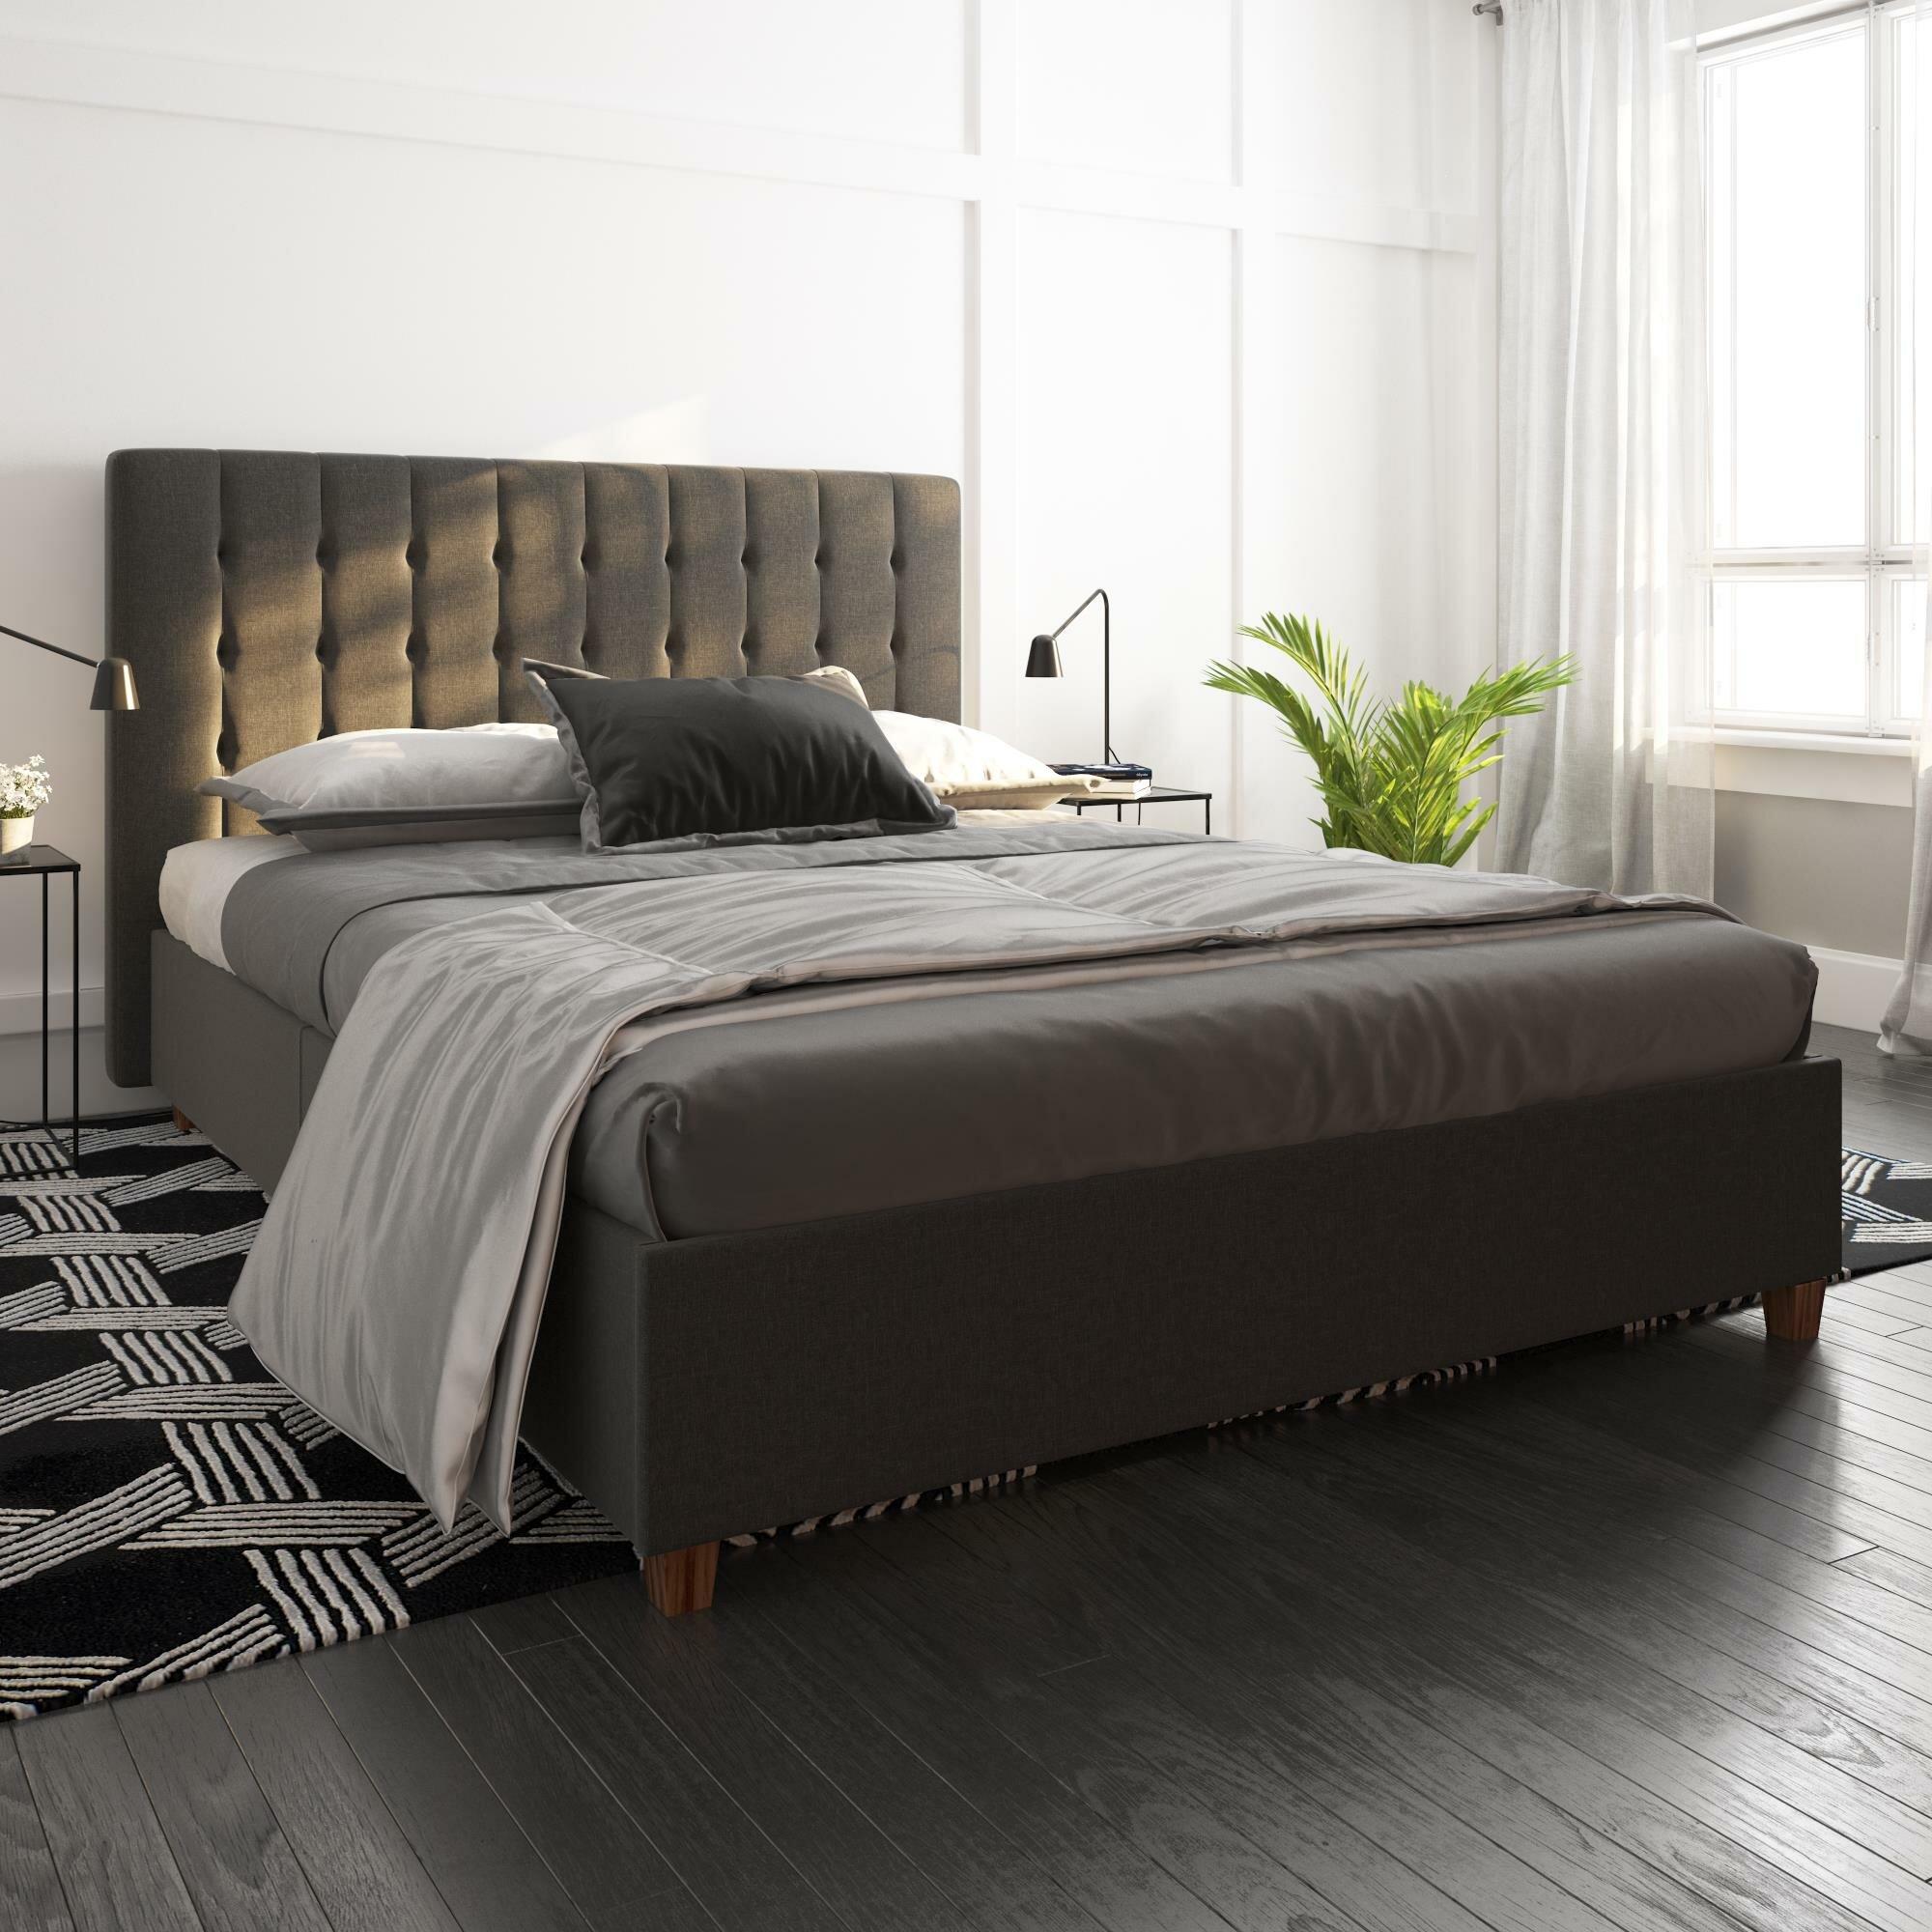 Double Full Size Beds Wayfair